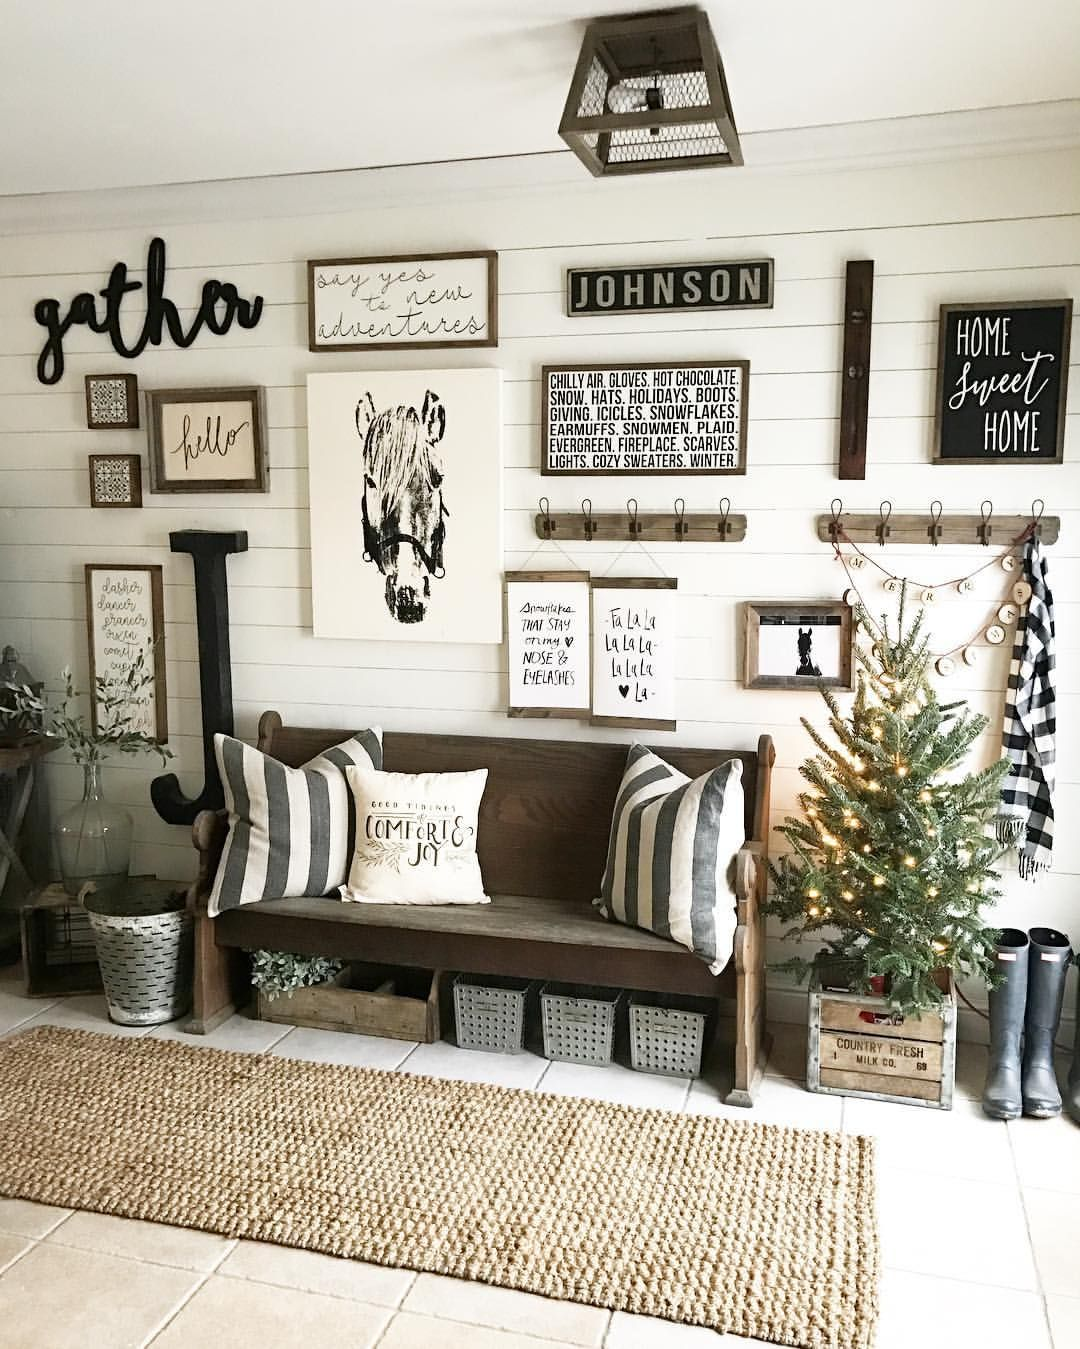 Pin by Kim Gerber Buckius on Log Cabin Airbnb | Pinterest ...